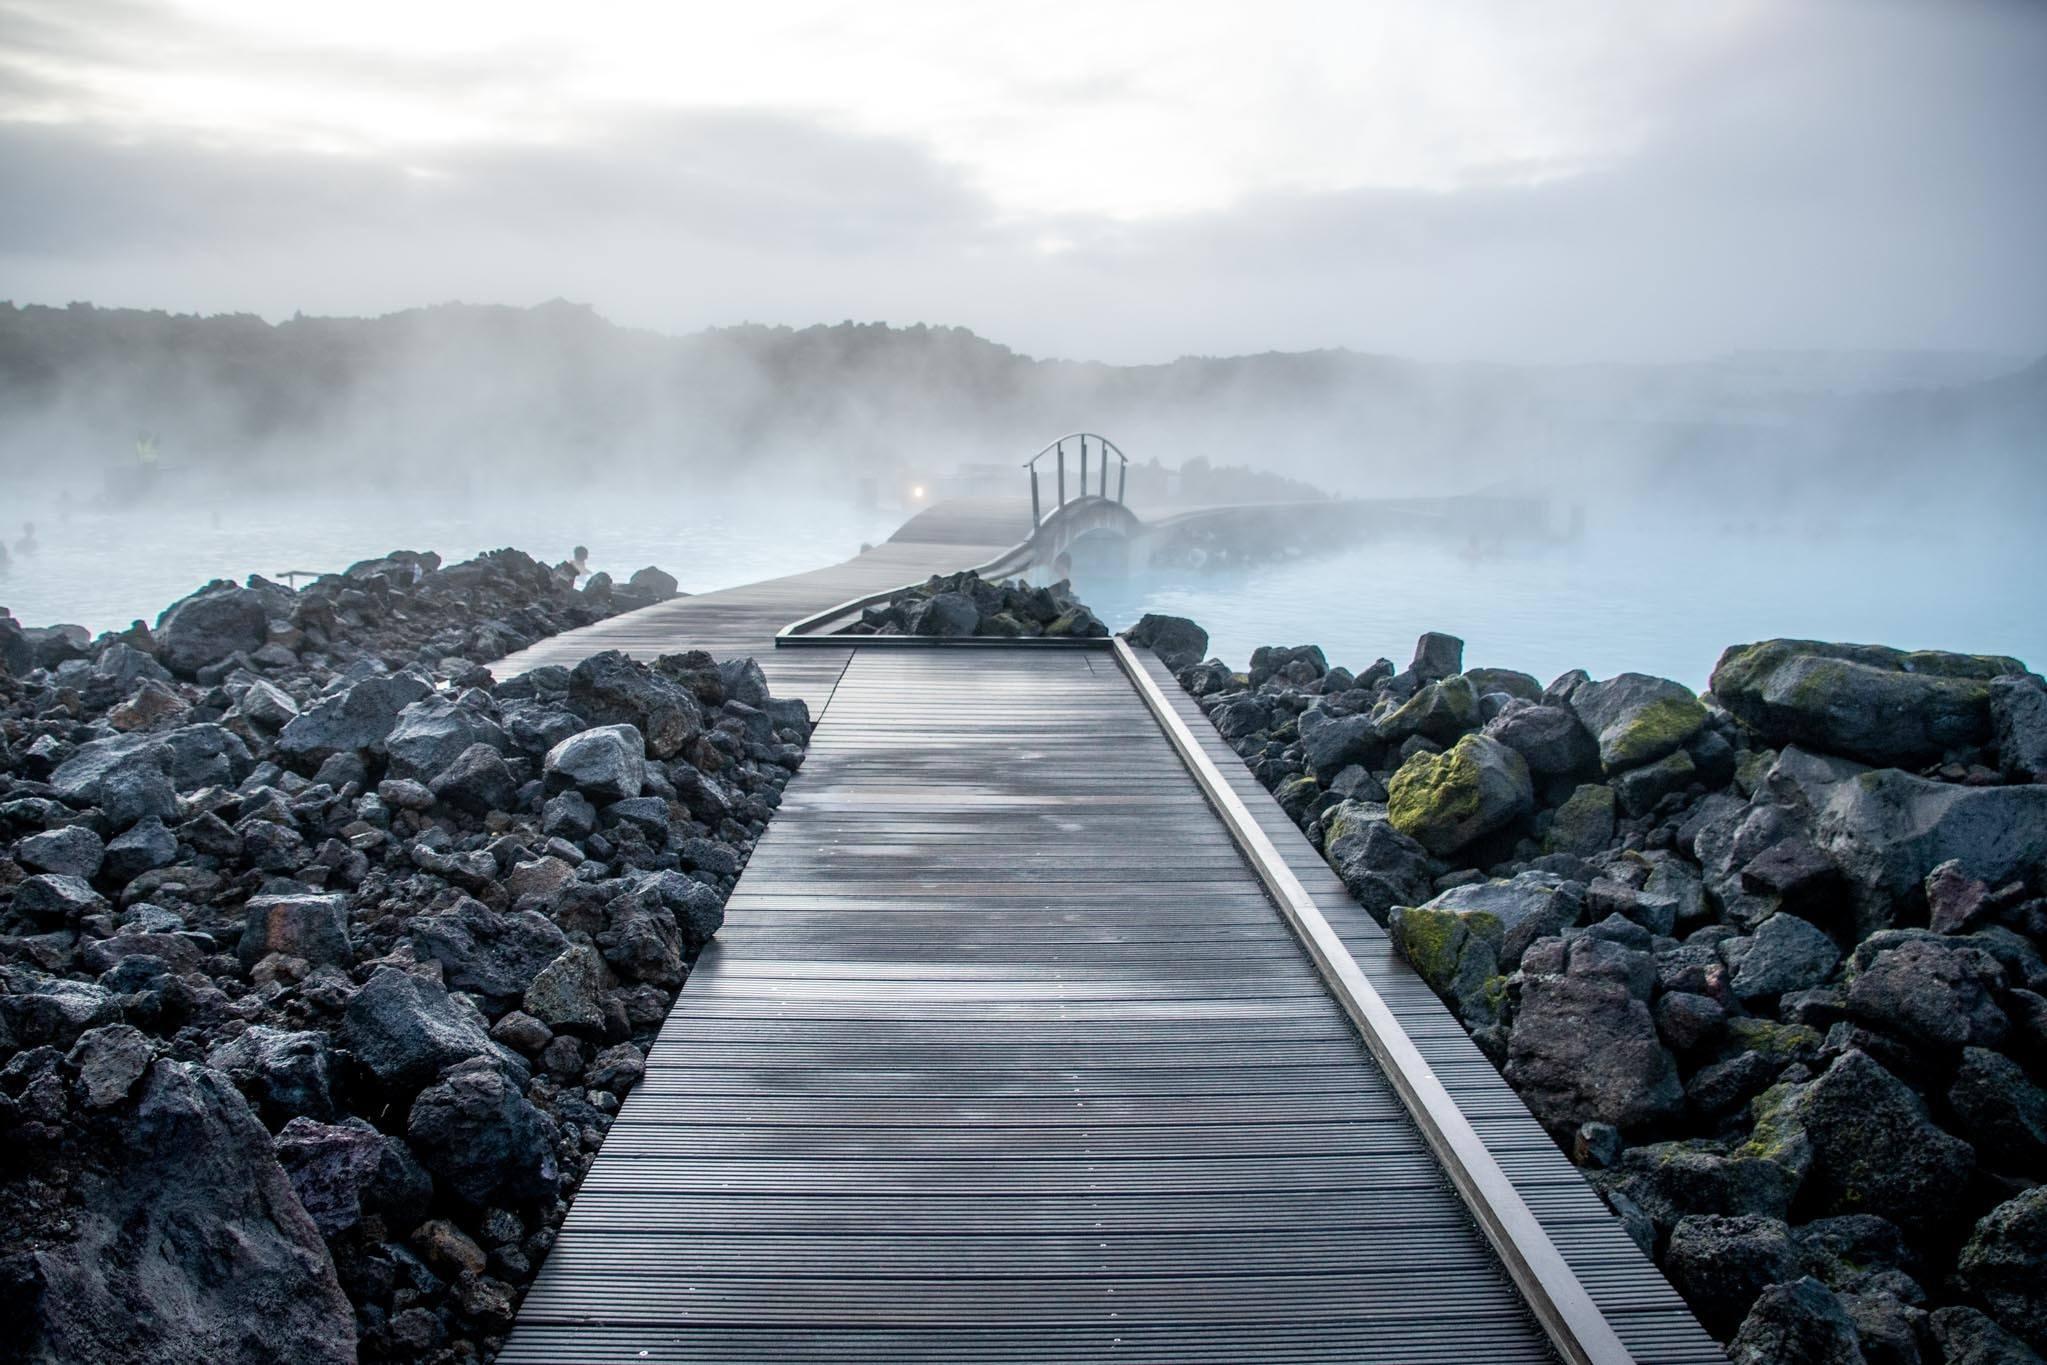 Sidewalks among the steam